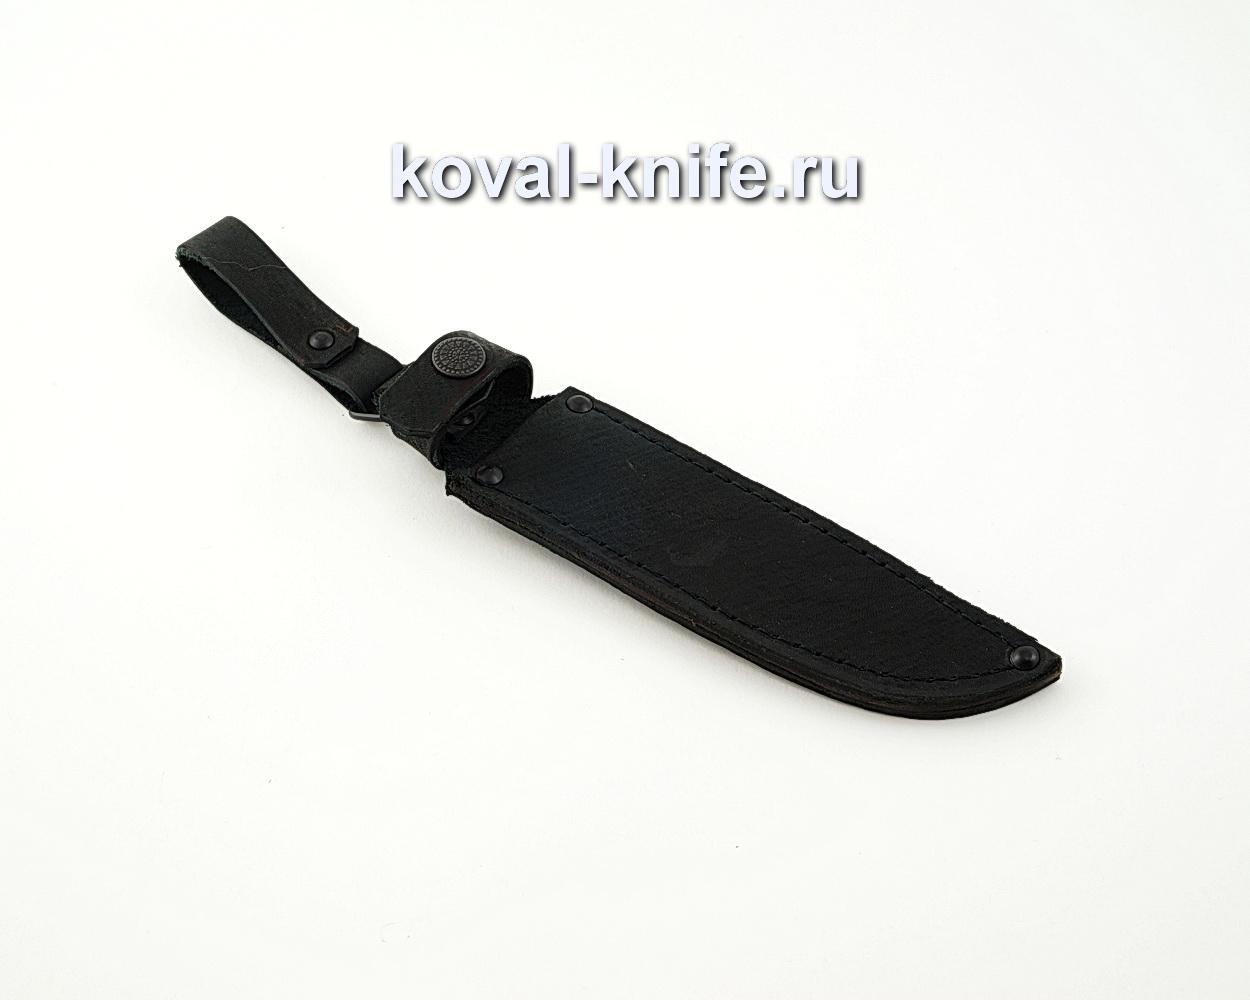 Кожаный чехол (нож Штрафбат)